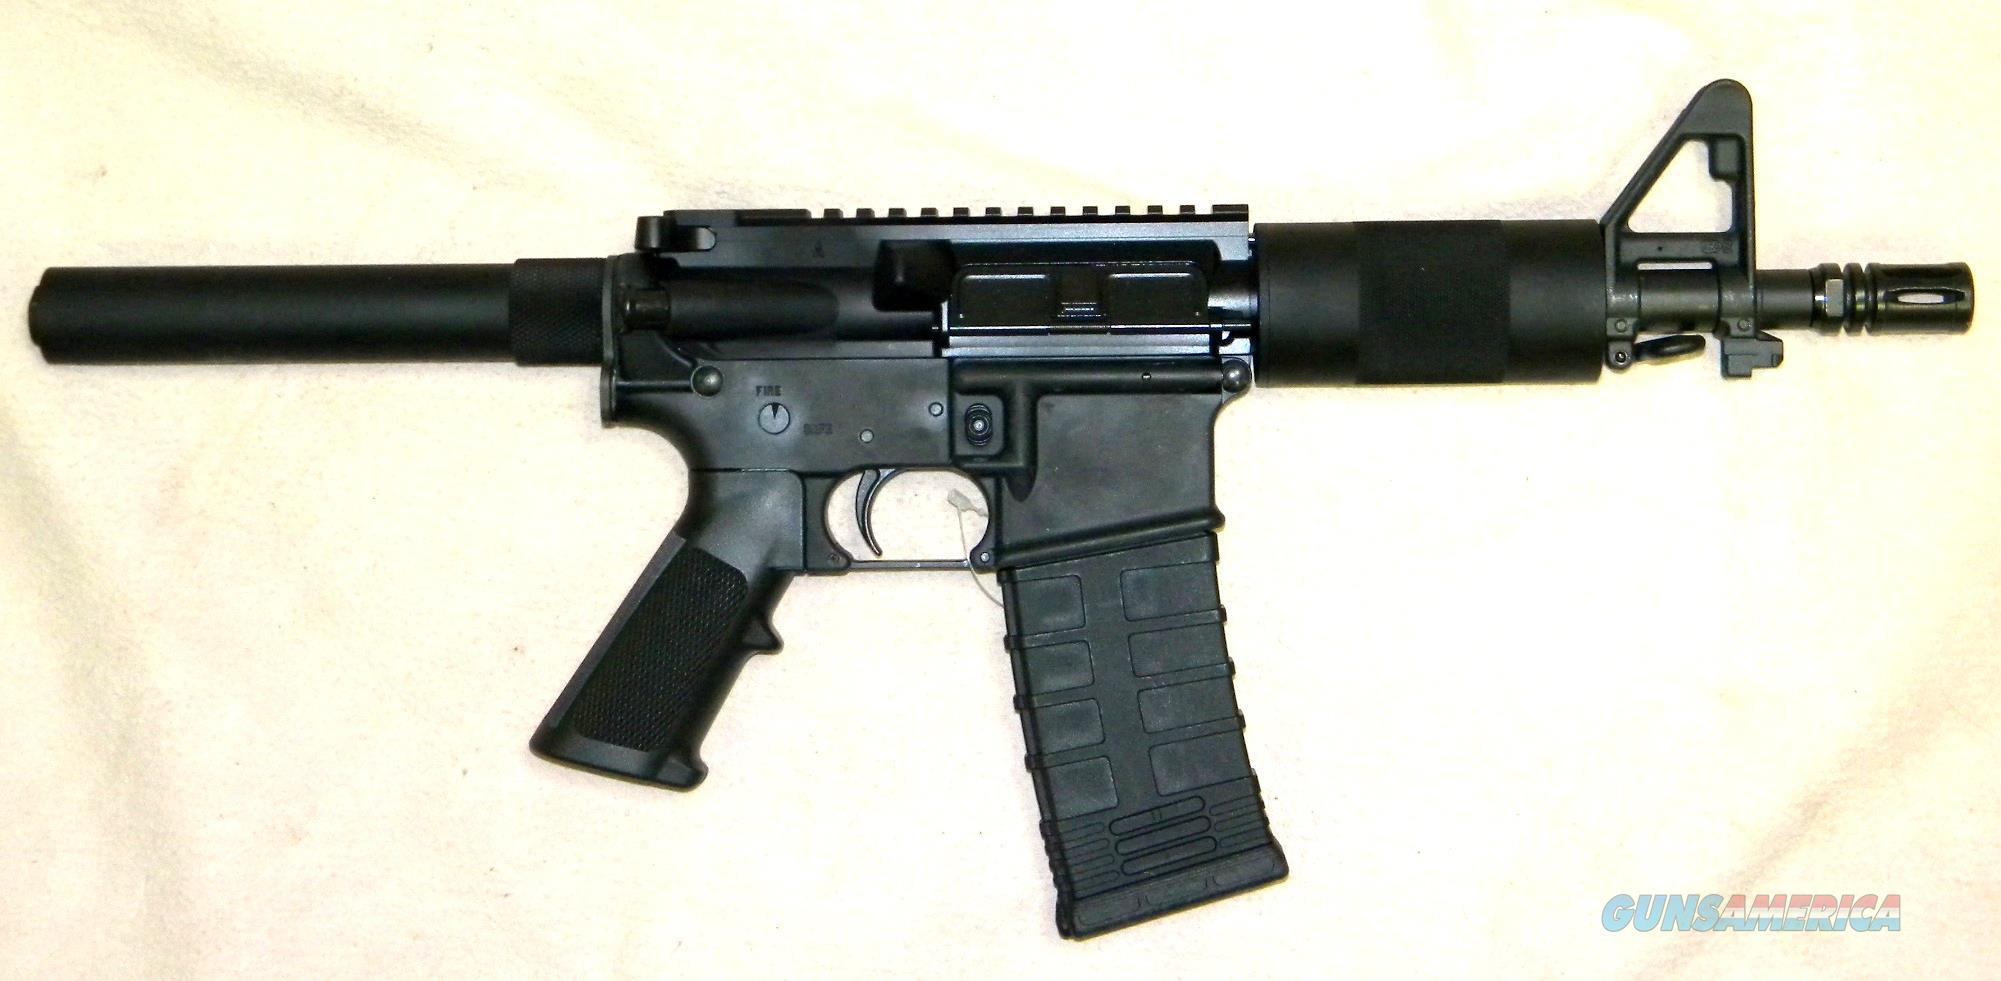 LAR Grizzly-15 .223/5.56 AR-Style Pistol  Guns > Pistols > LAR/Grizzly Mfg. Co. Pistols